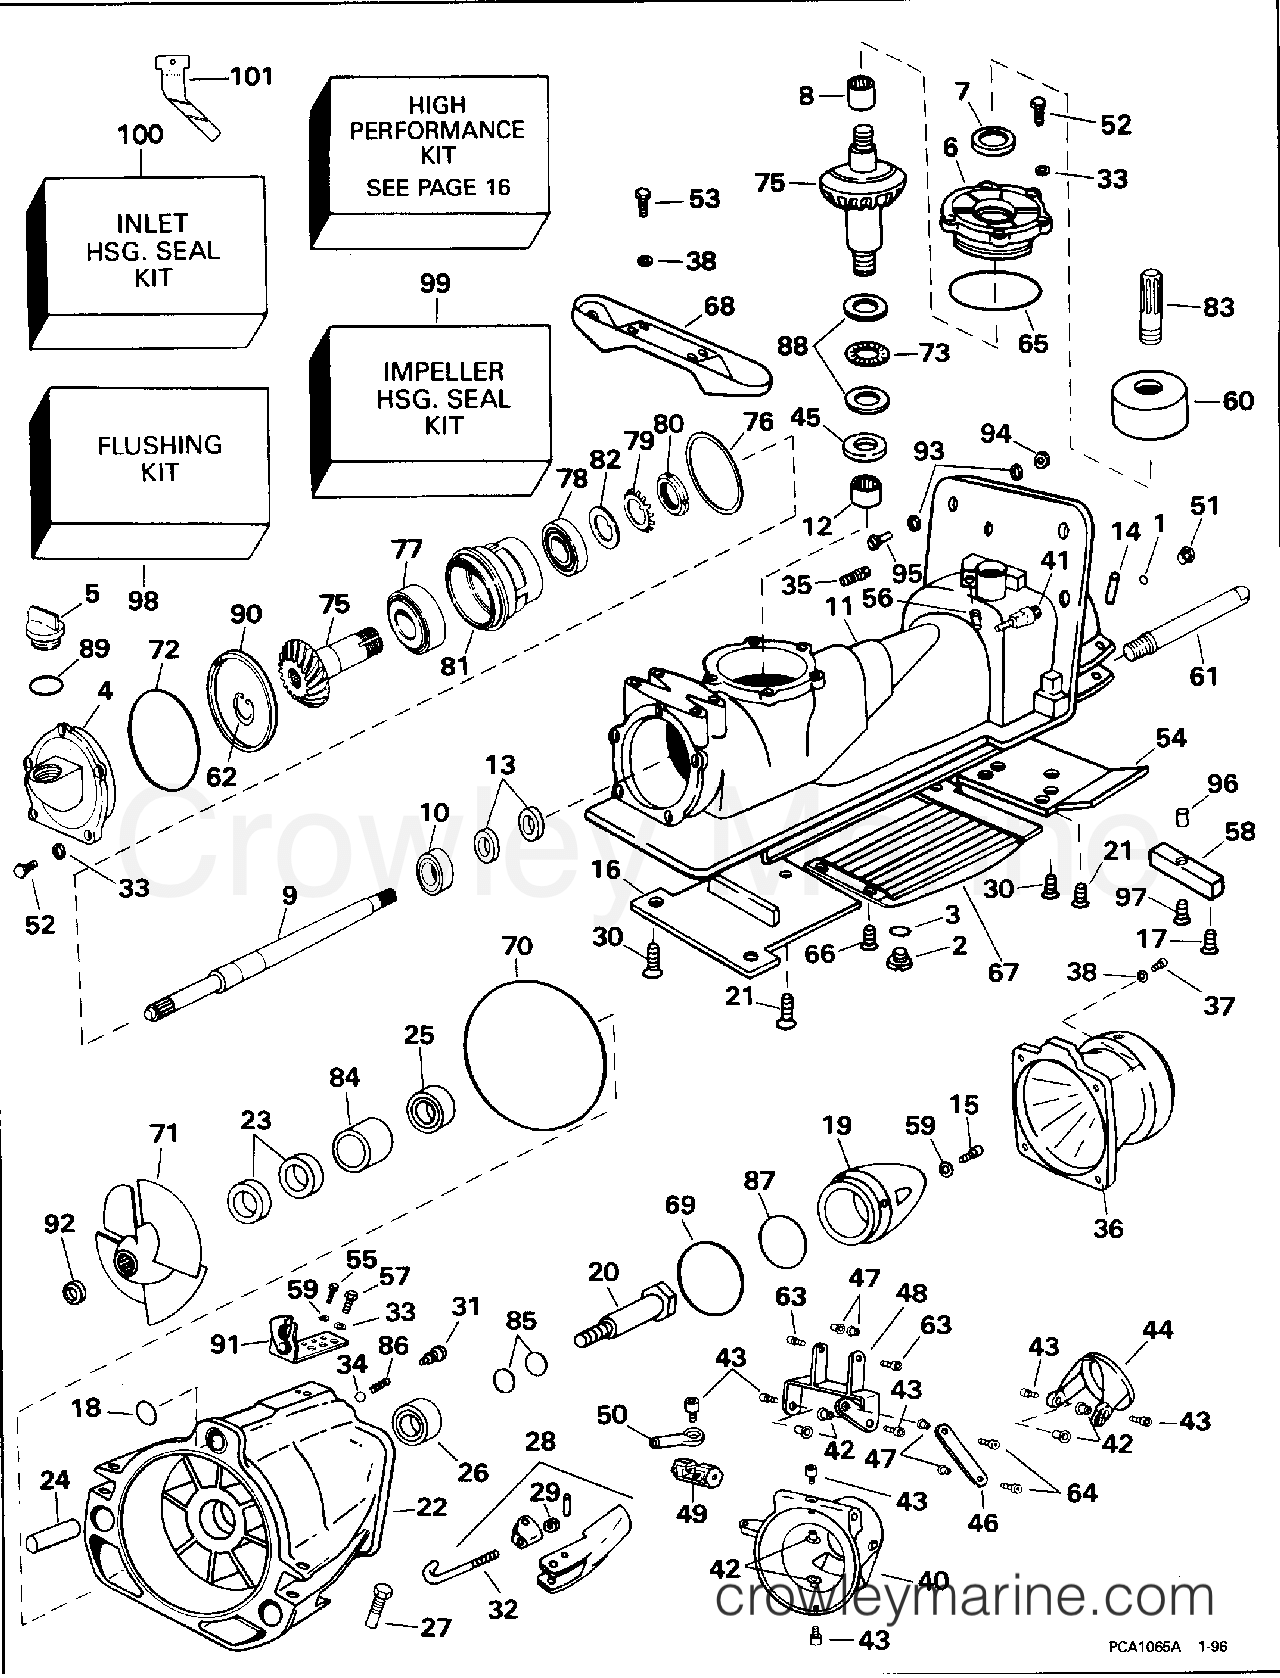 1996 OMC TurboJet 115 - 115TJEDB - JET PUMP section